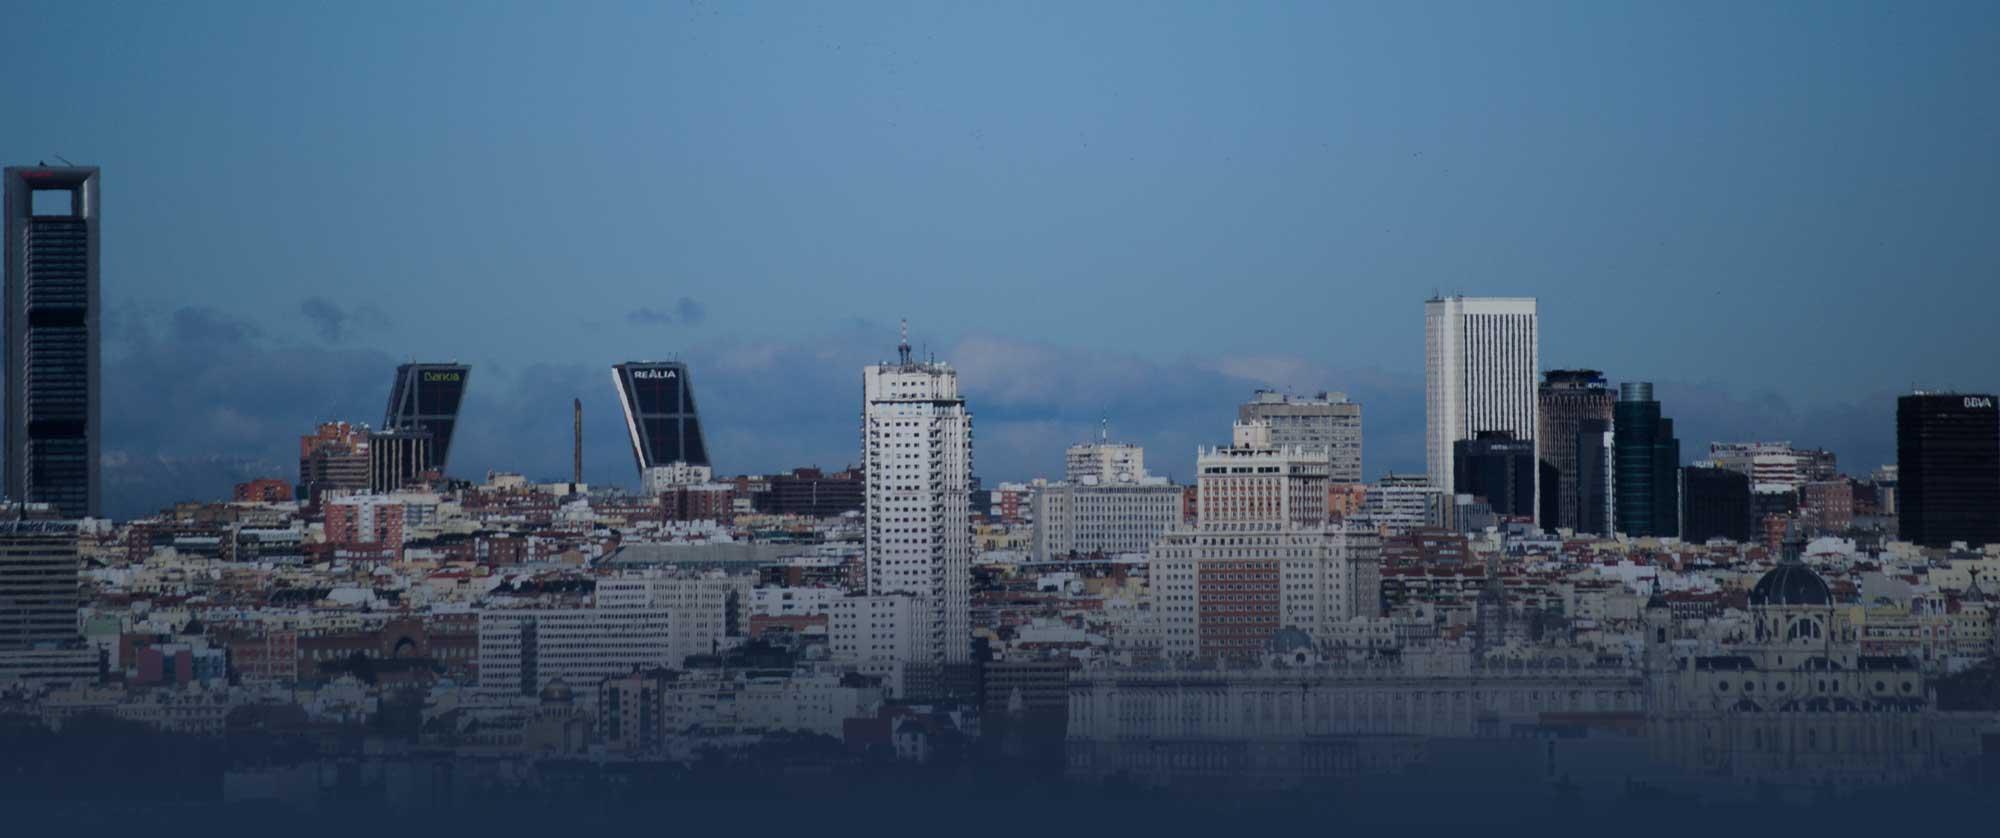 Íbero CM inyectará hasta 250 millones a promotoras en 2019